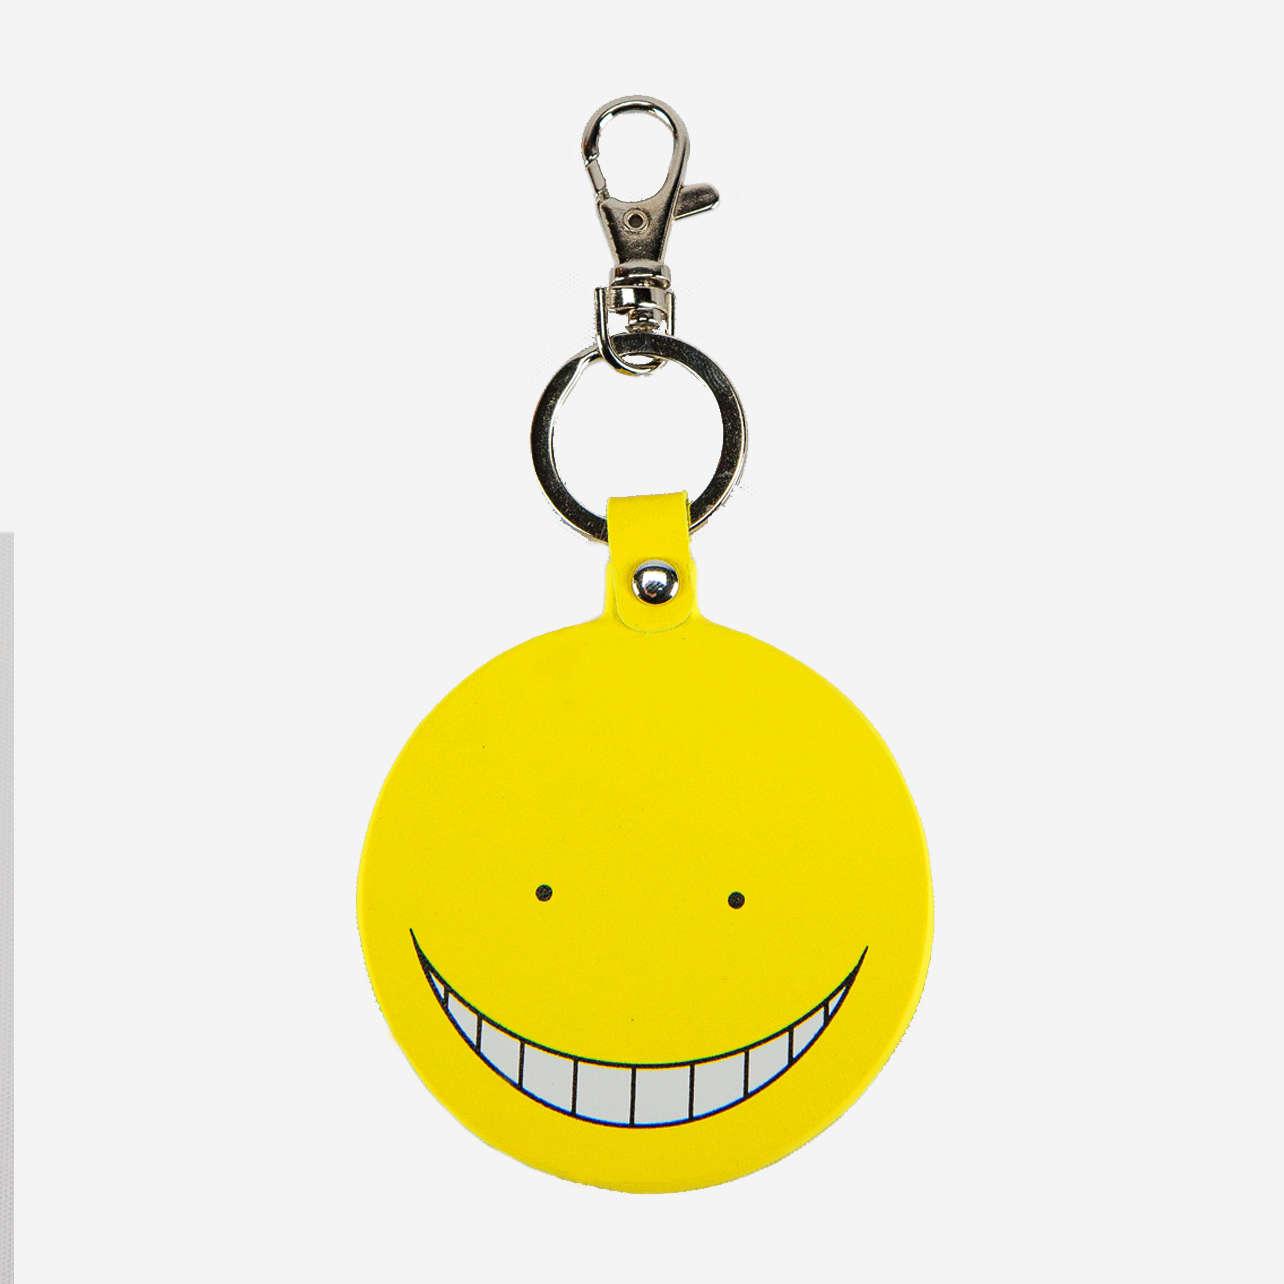 Koro Sensei Keychain accessories